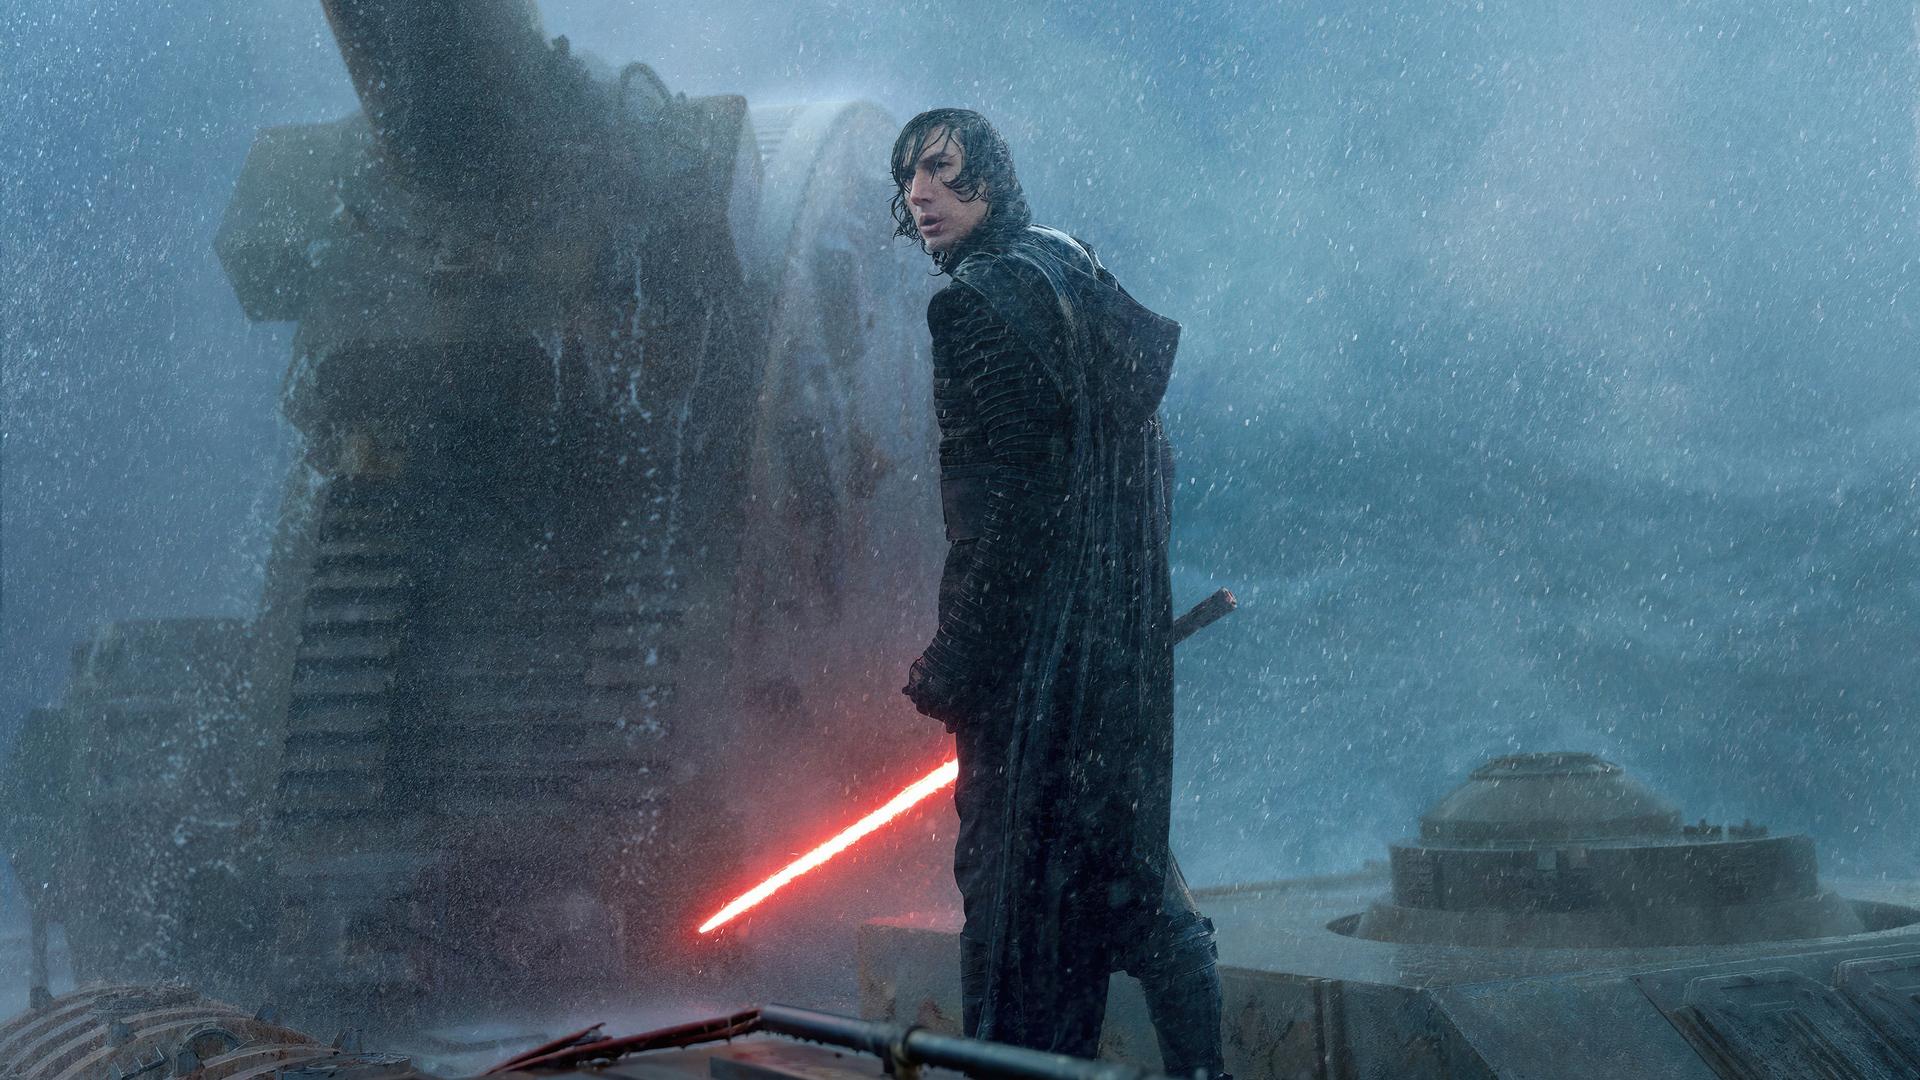 1920x1080 Kylo Ren In Star Wars The Rise Of Skywalker Laptop